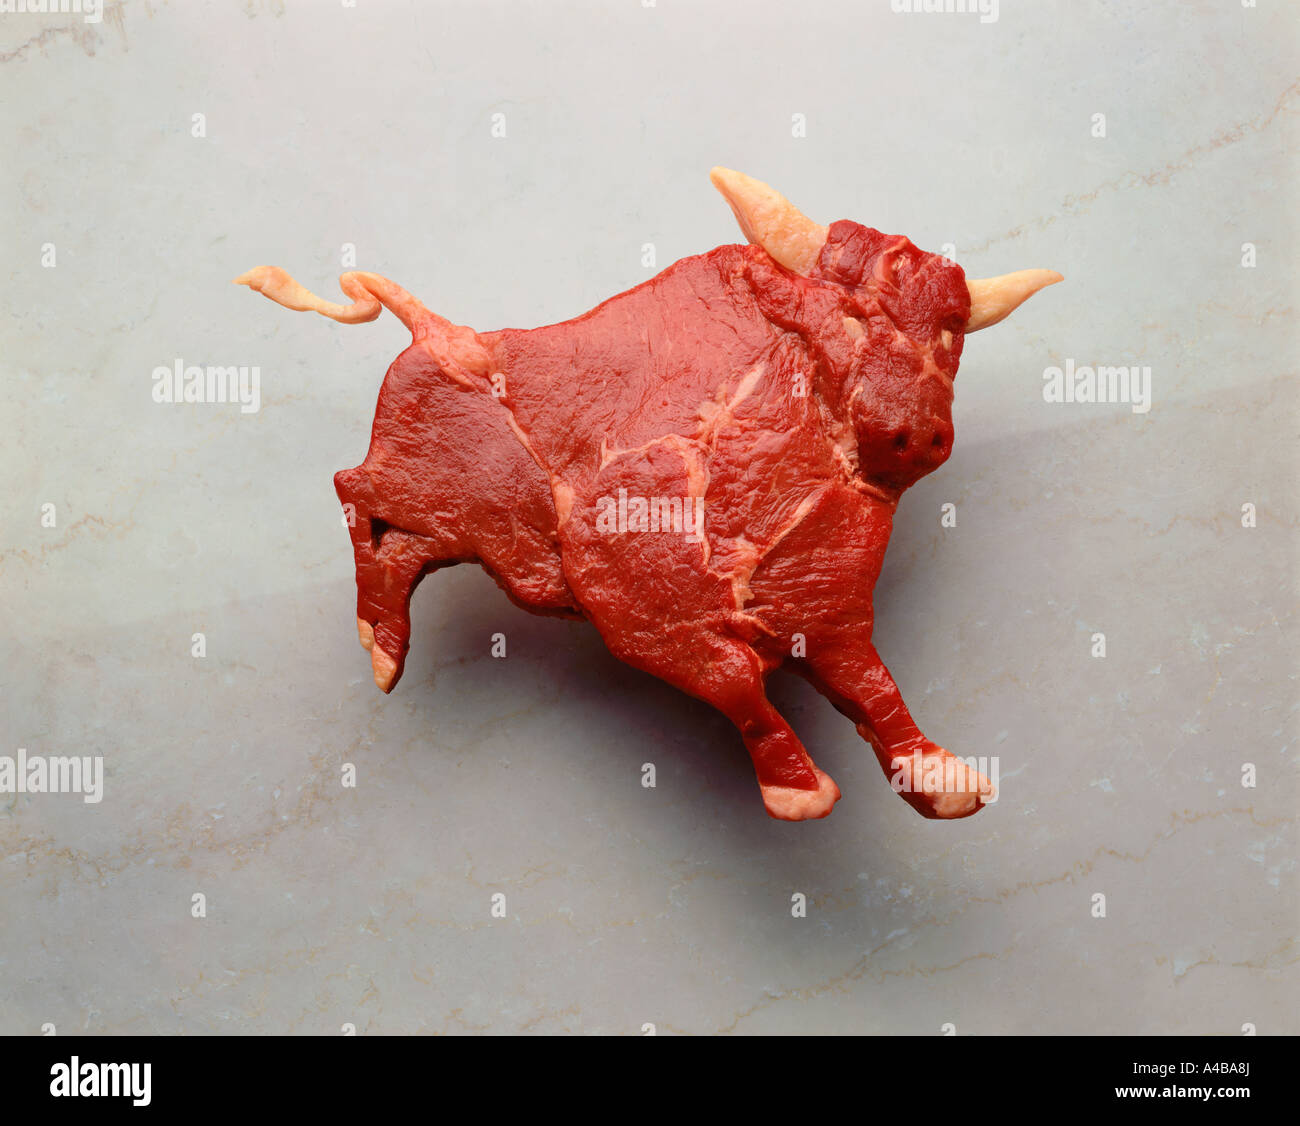 Carne cruda gustó forma un toro Imagen De Stock